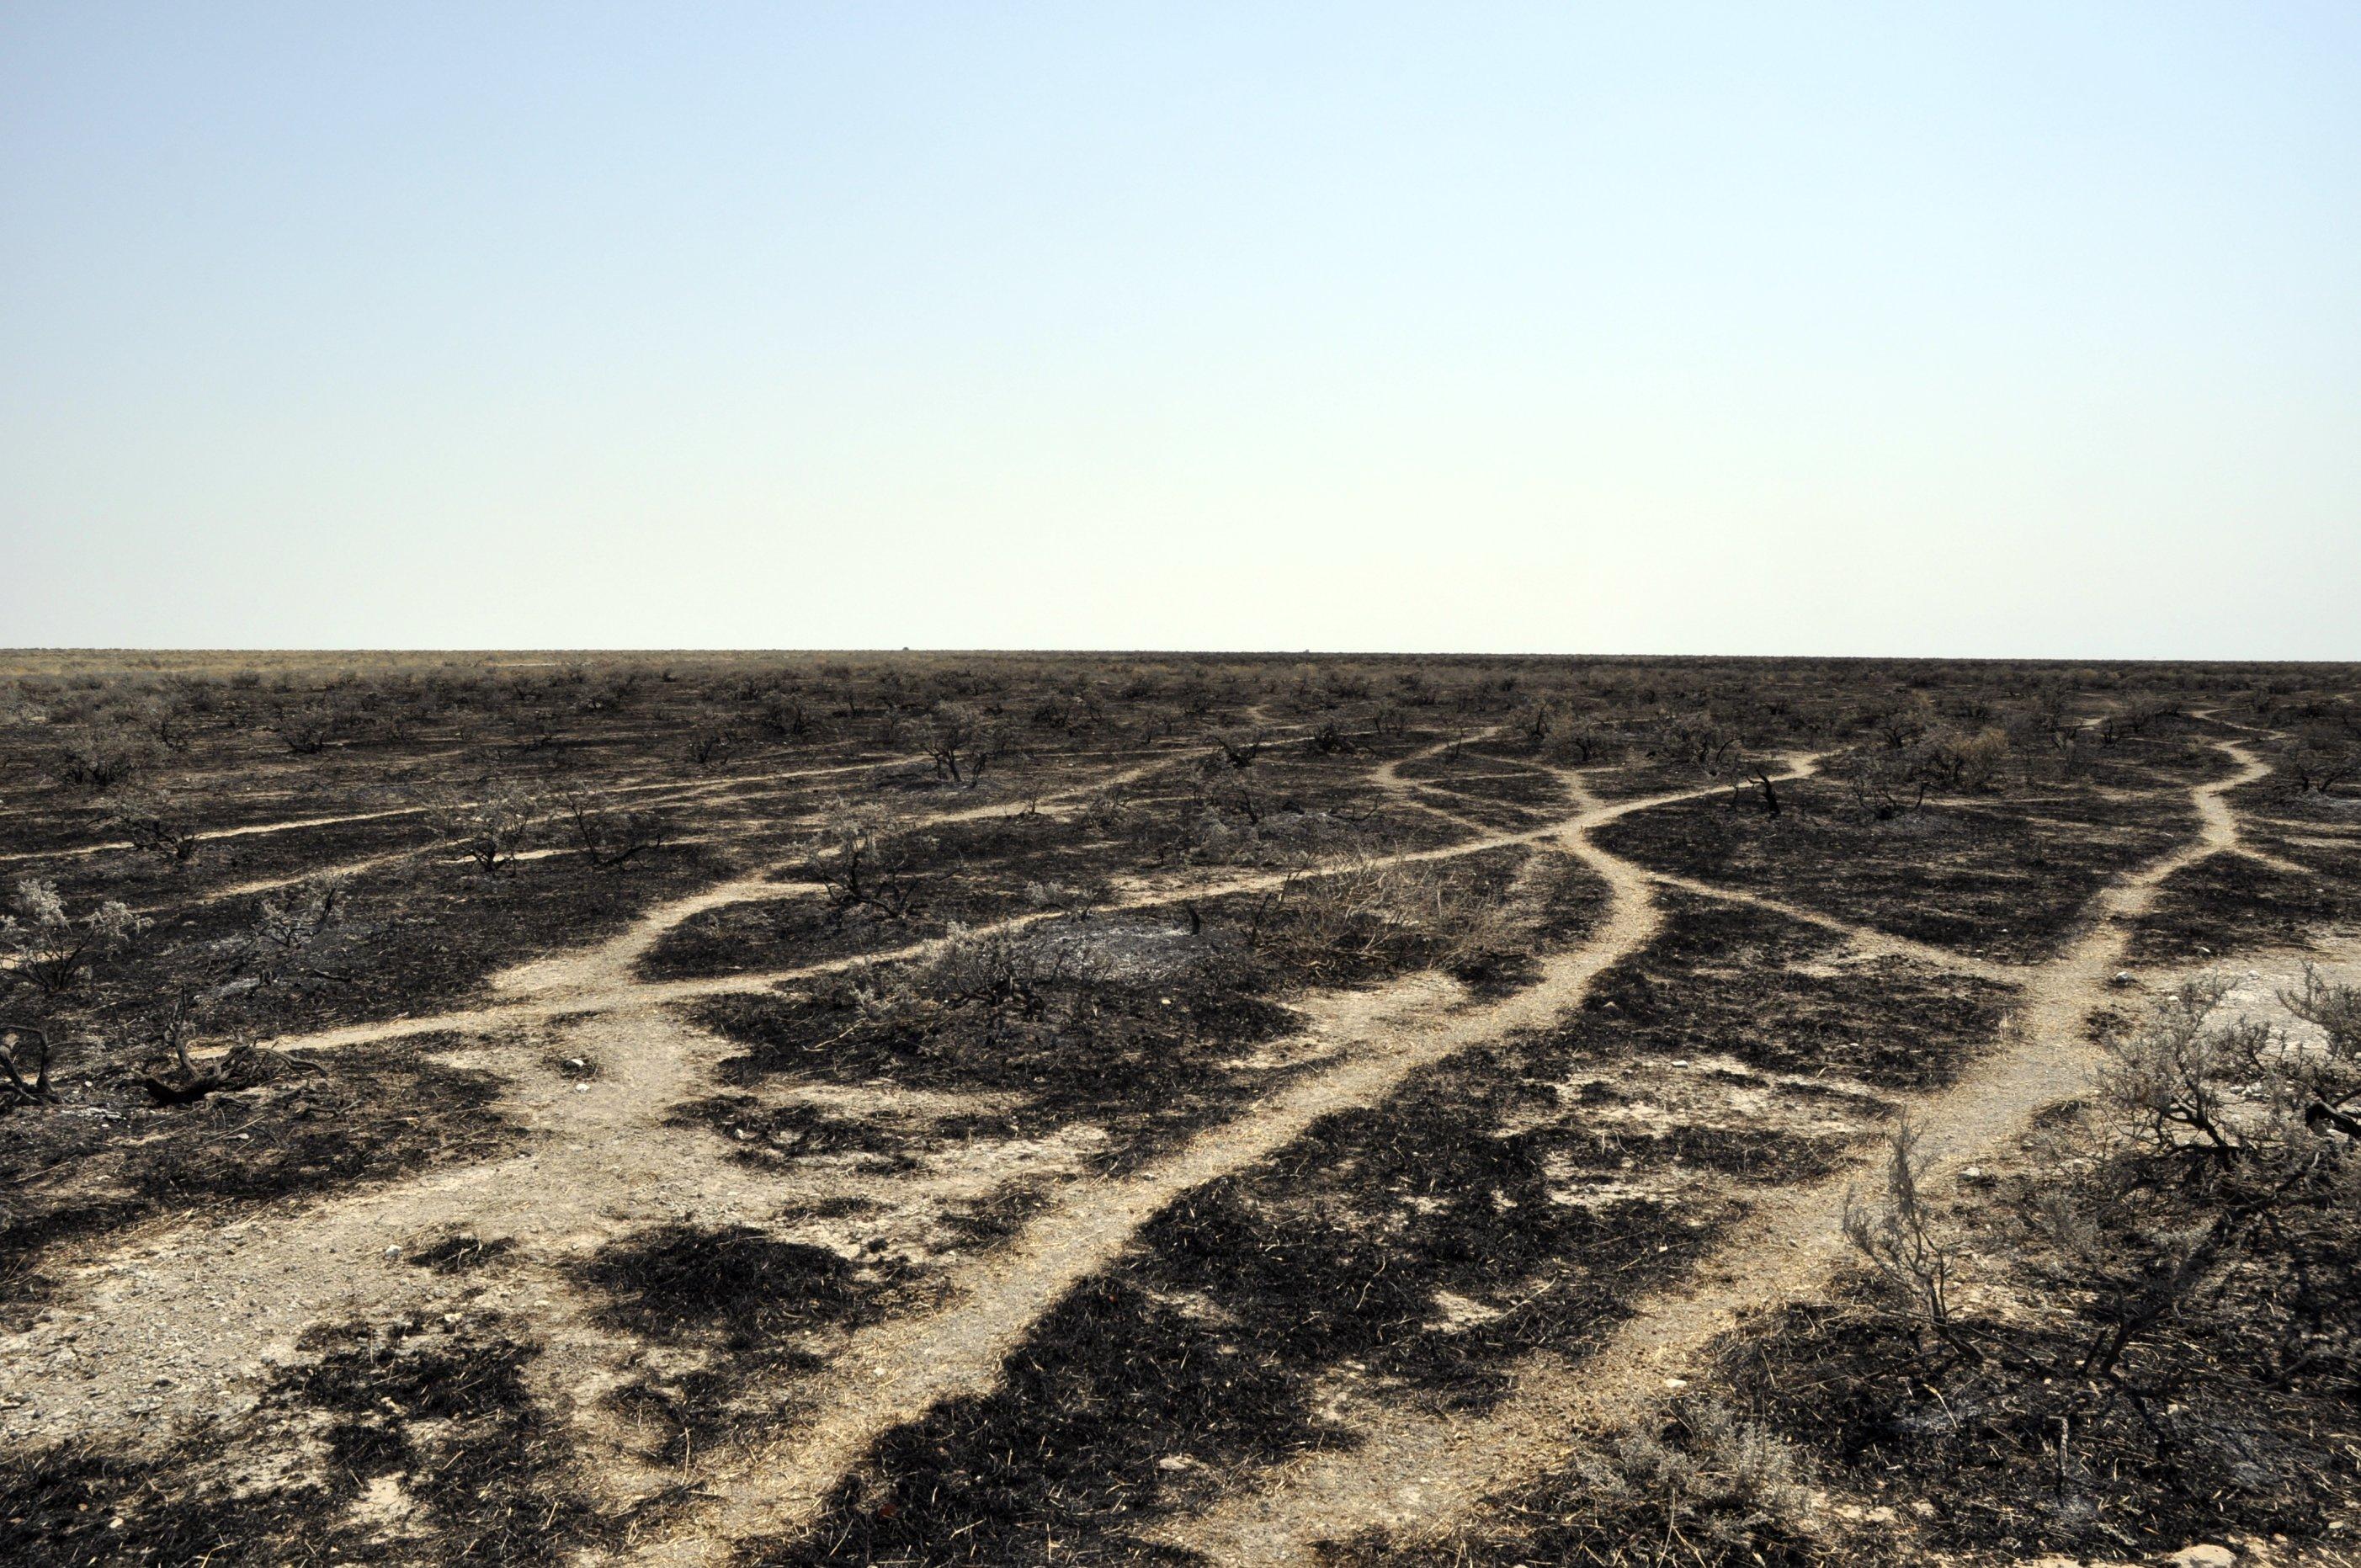 Spaljena zemlja. Foto: Pim Stouten (http://www.flickr.com/photos/pimgmx/)